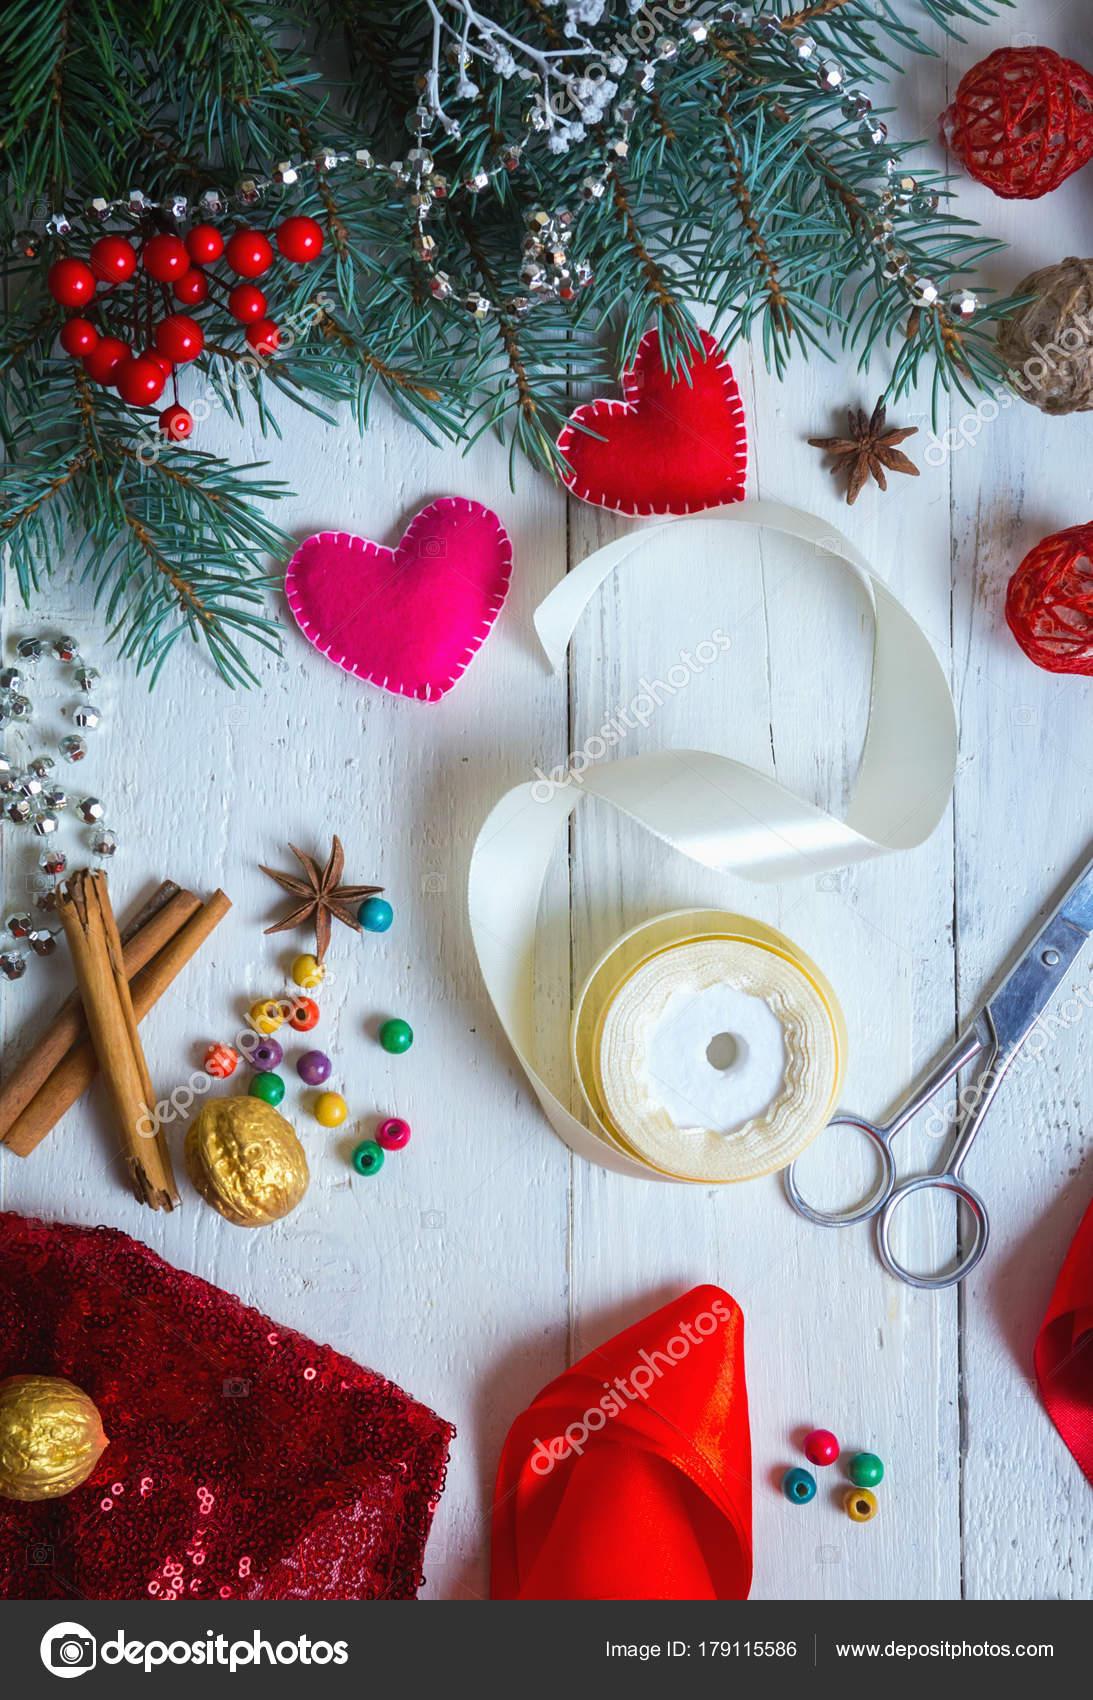 Valentines Day Christmas Handmade Or Wedding Decorations